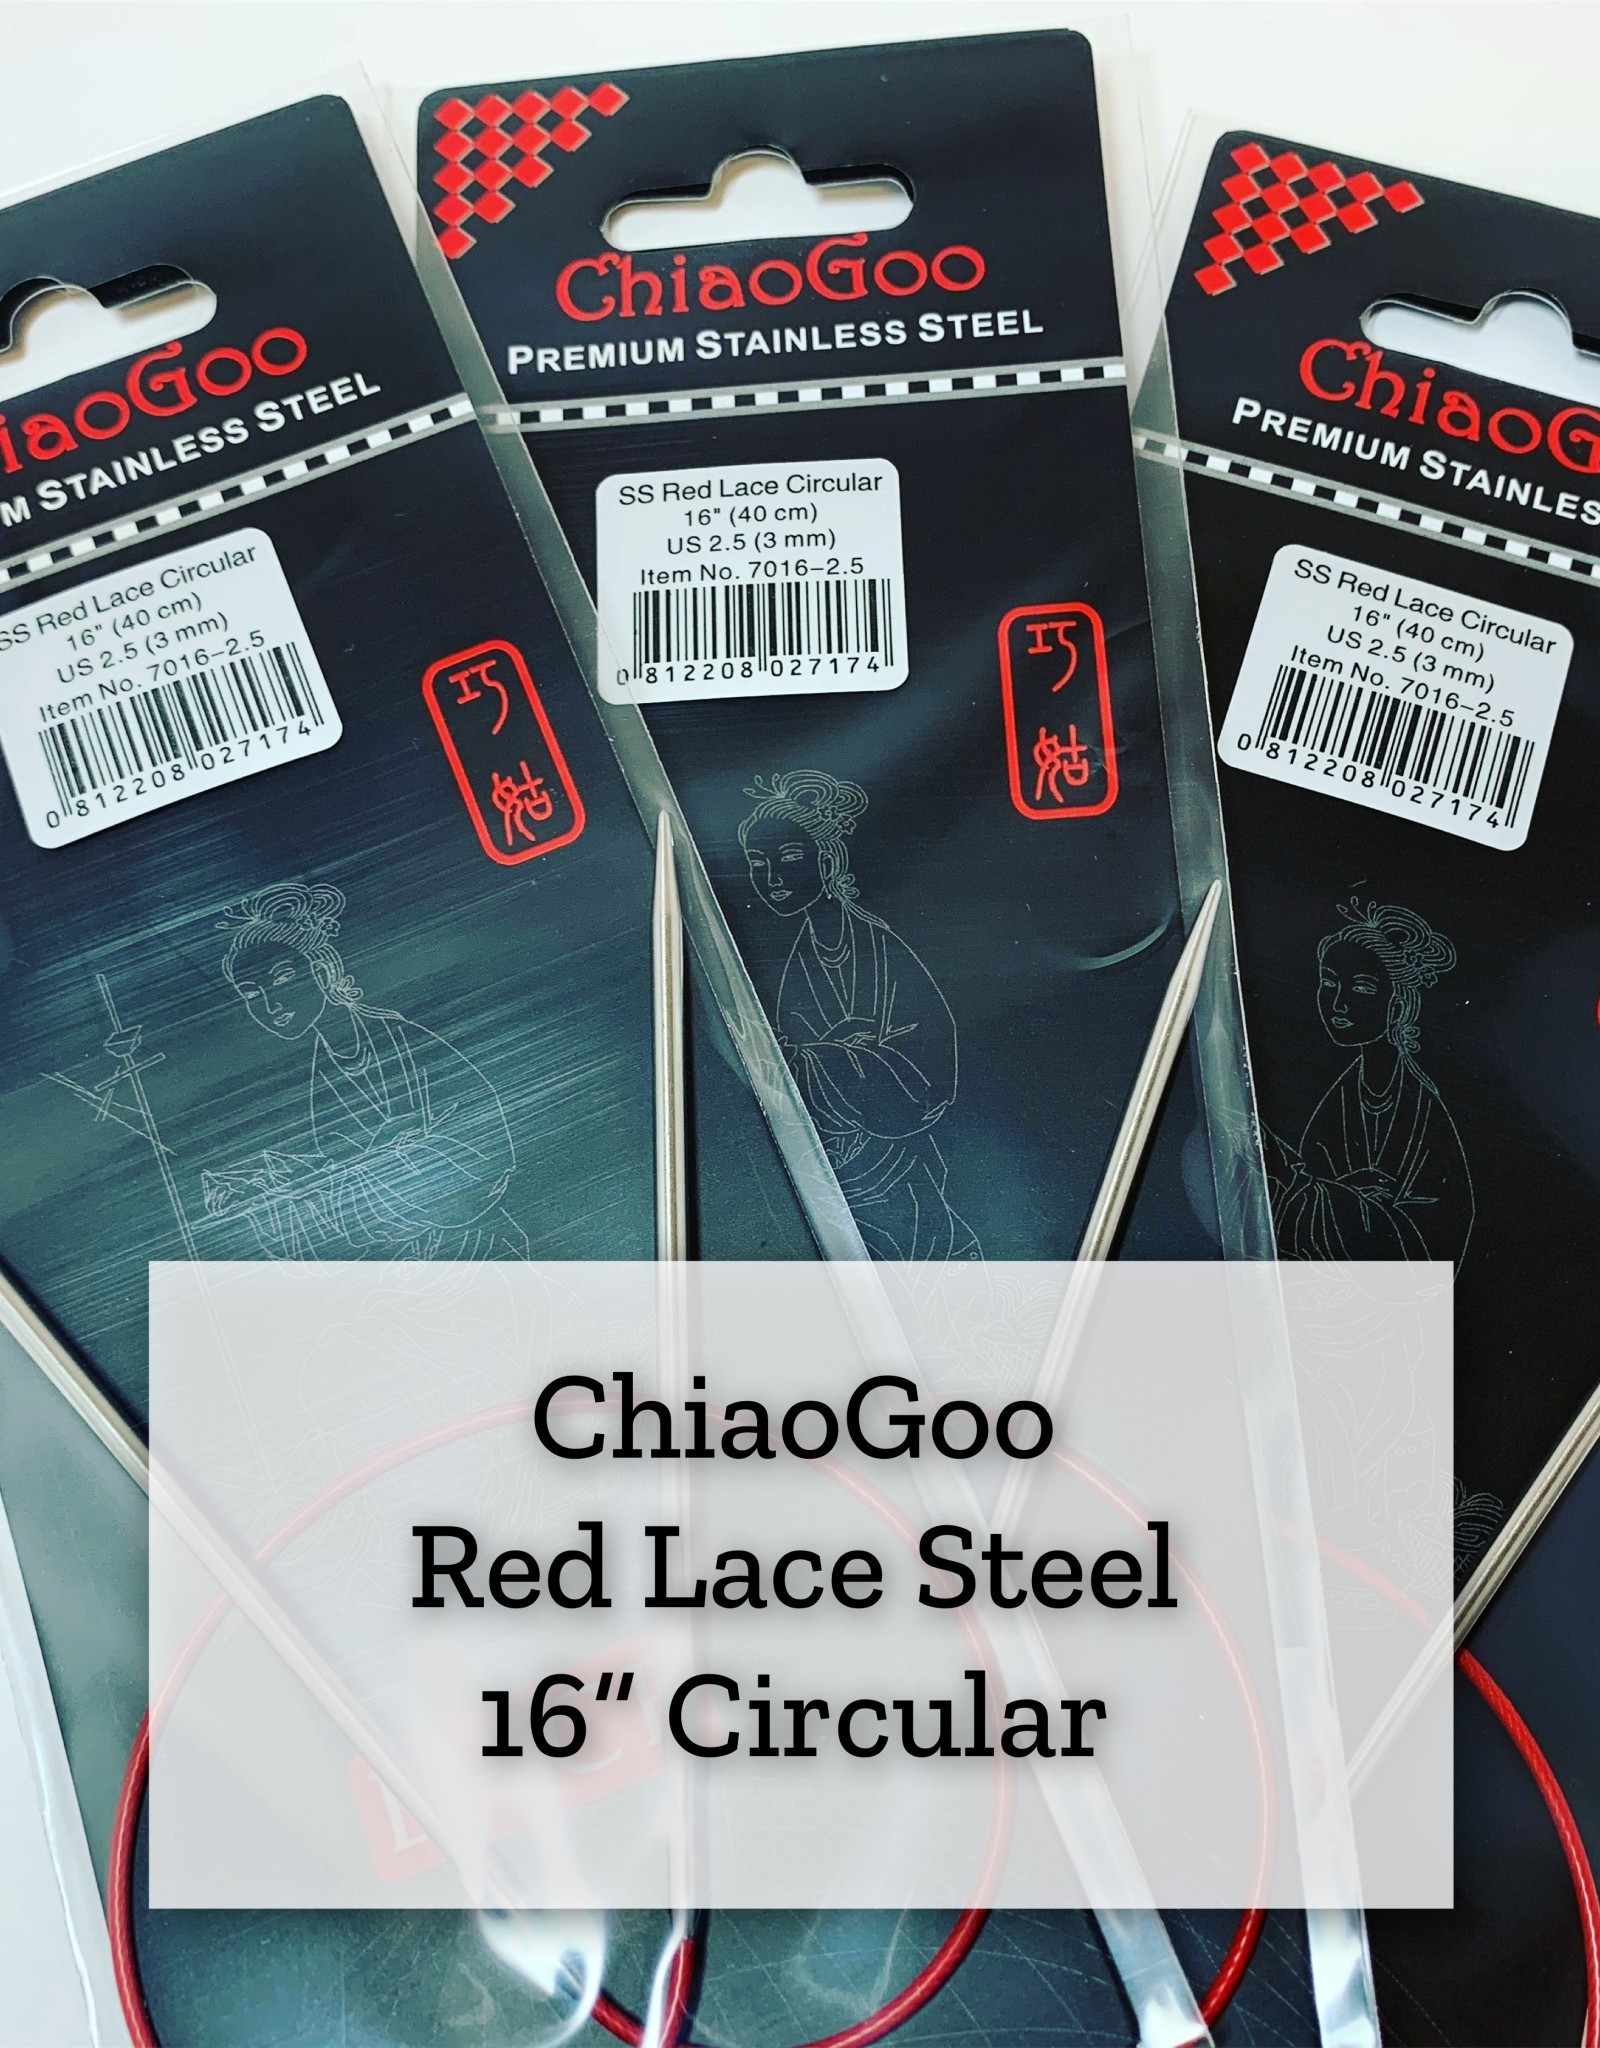 "ChiaoGoo Red Lace Steel - 16"" 10 mm"